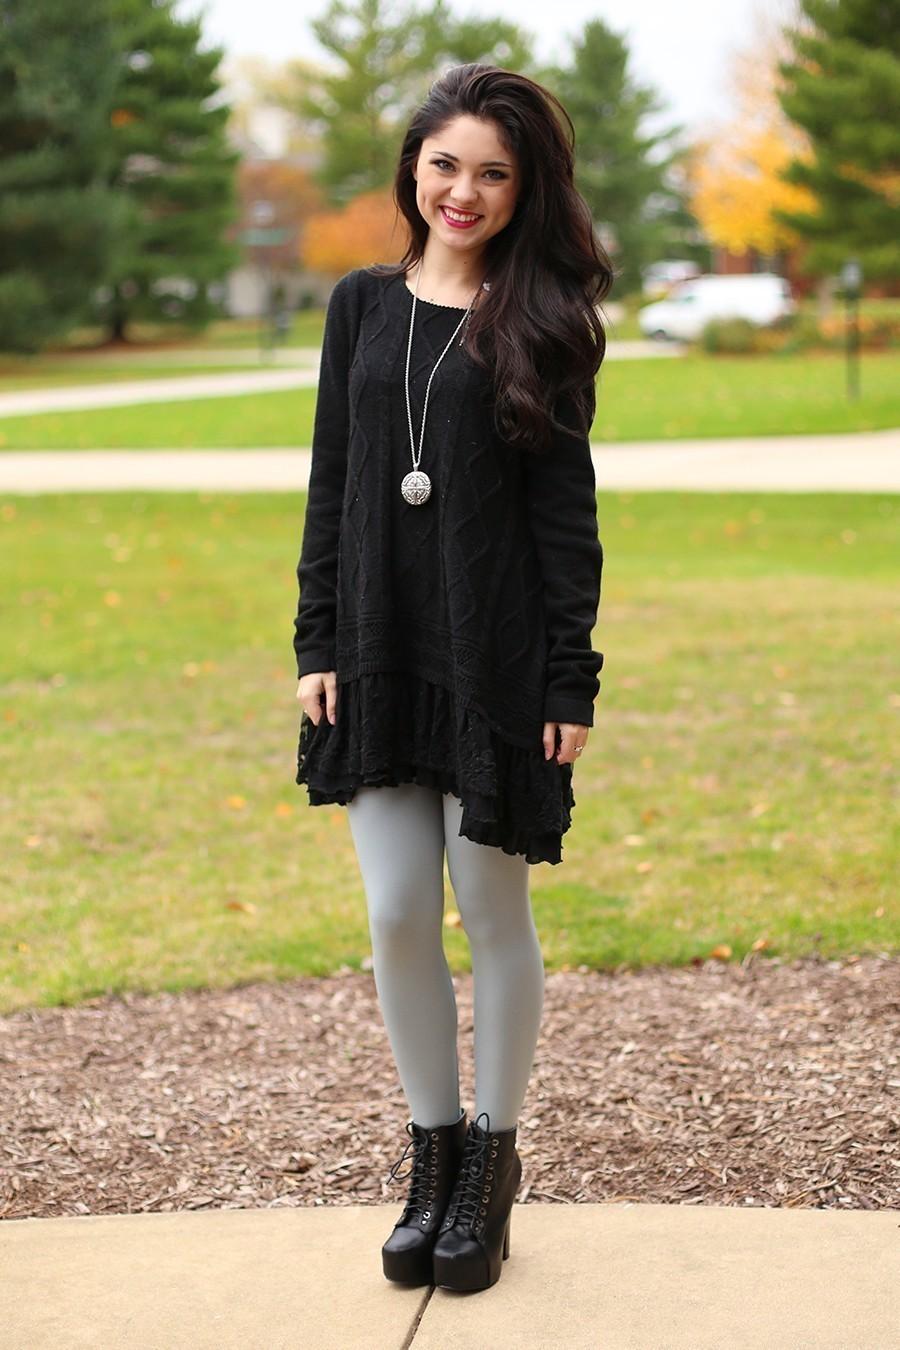 Womens Black Knit Sweater Dress Grey Leggings Black